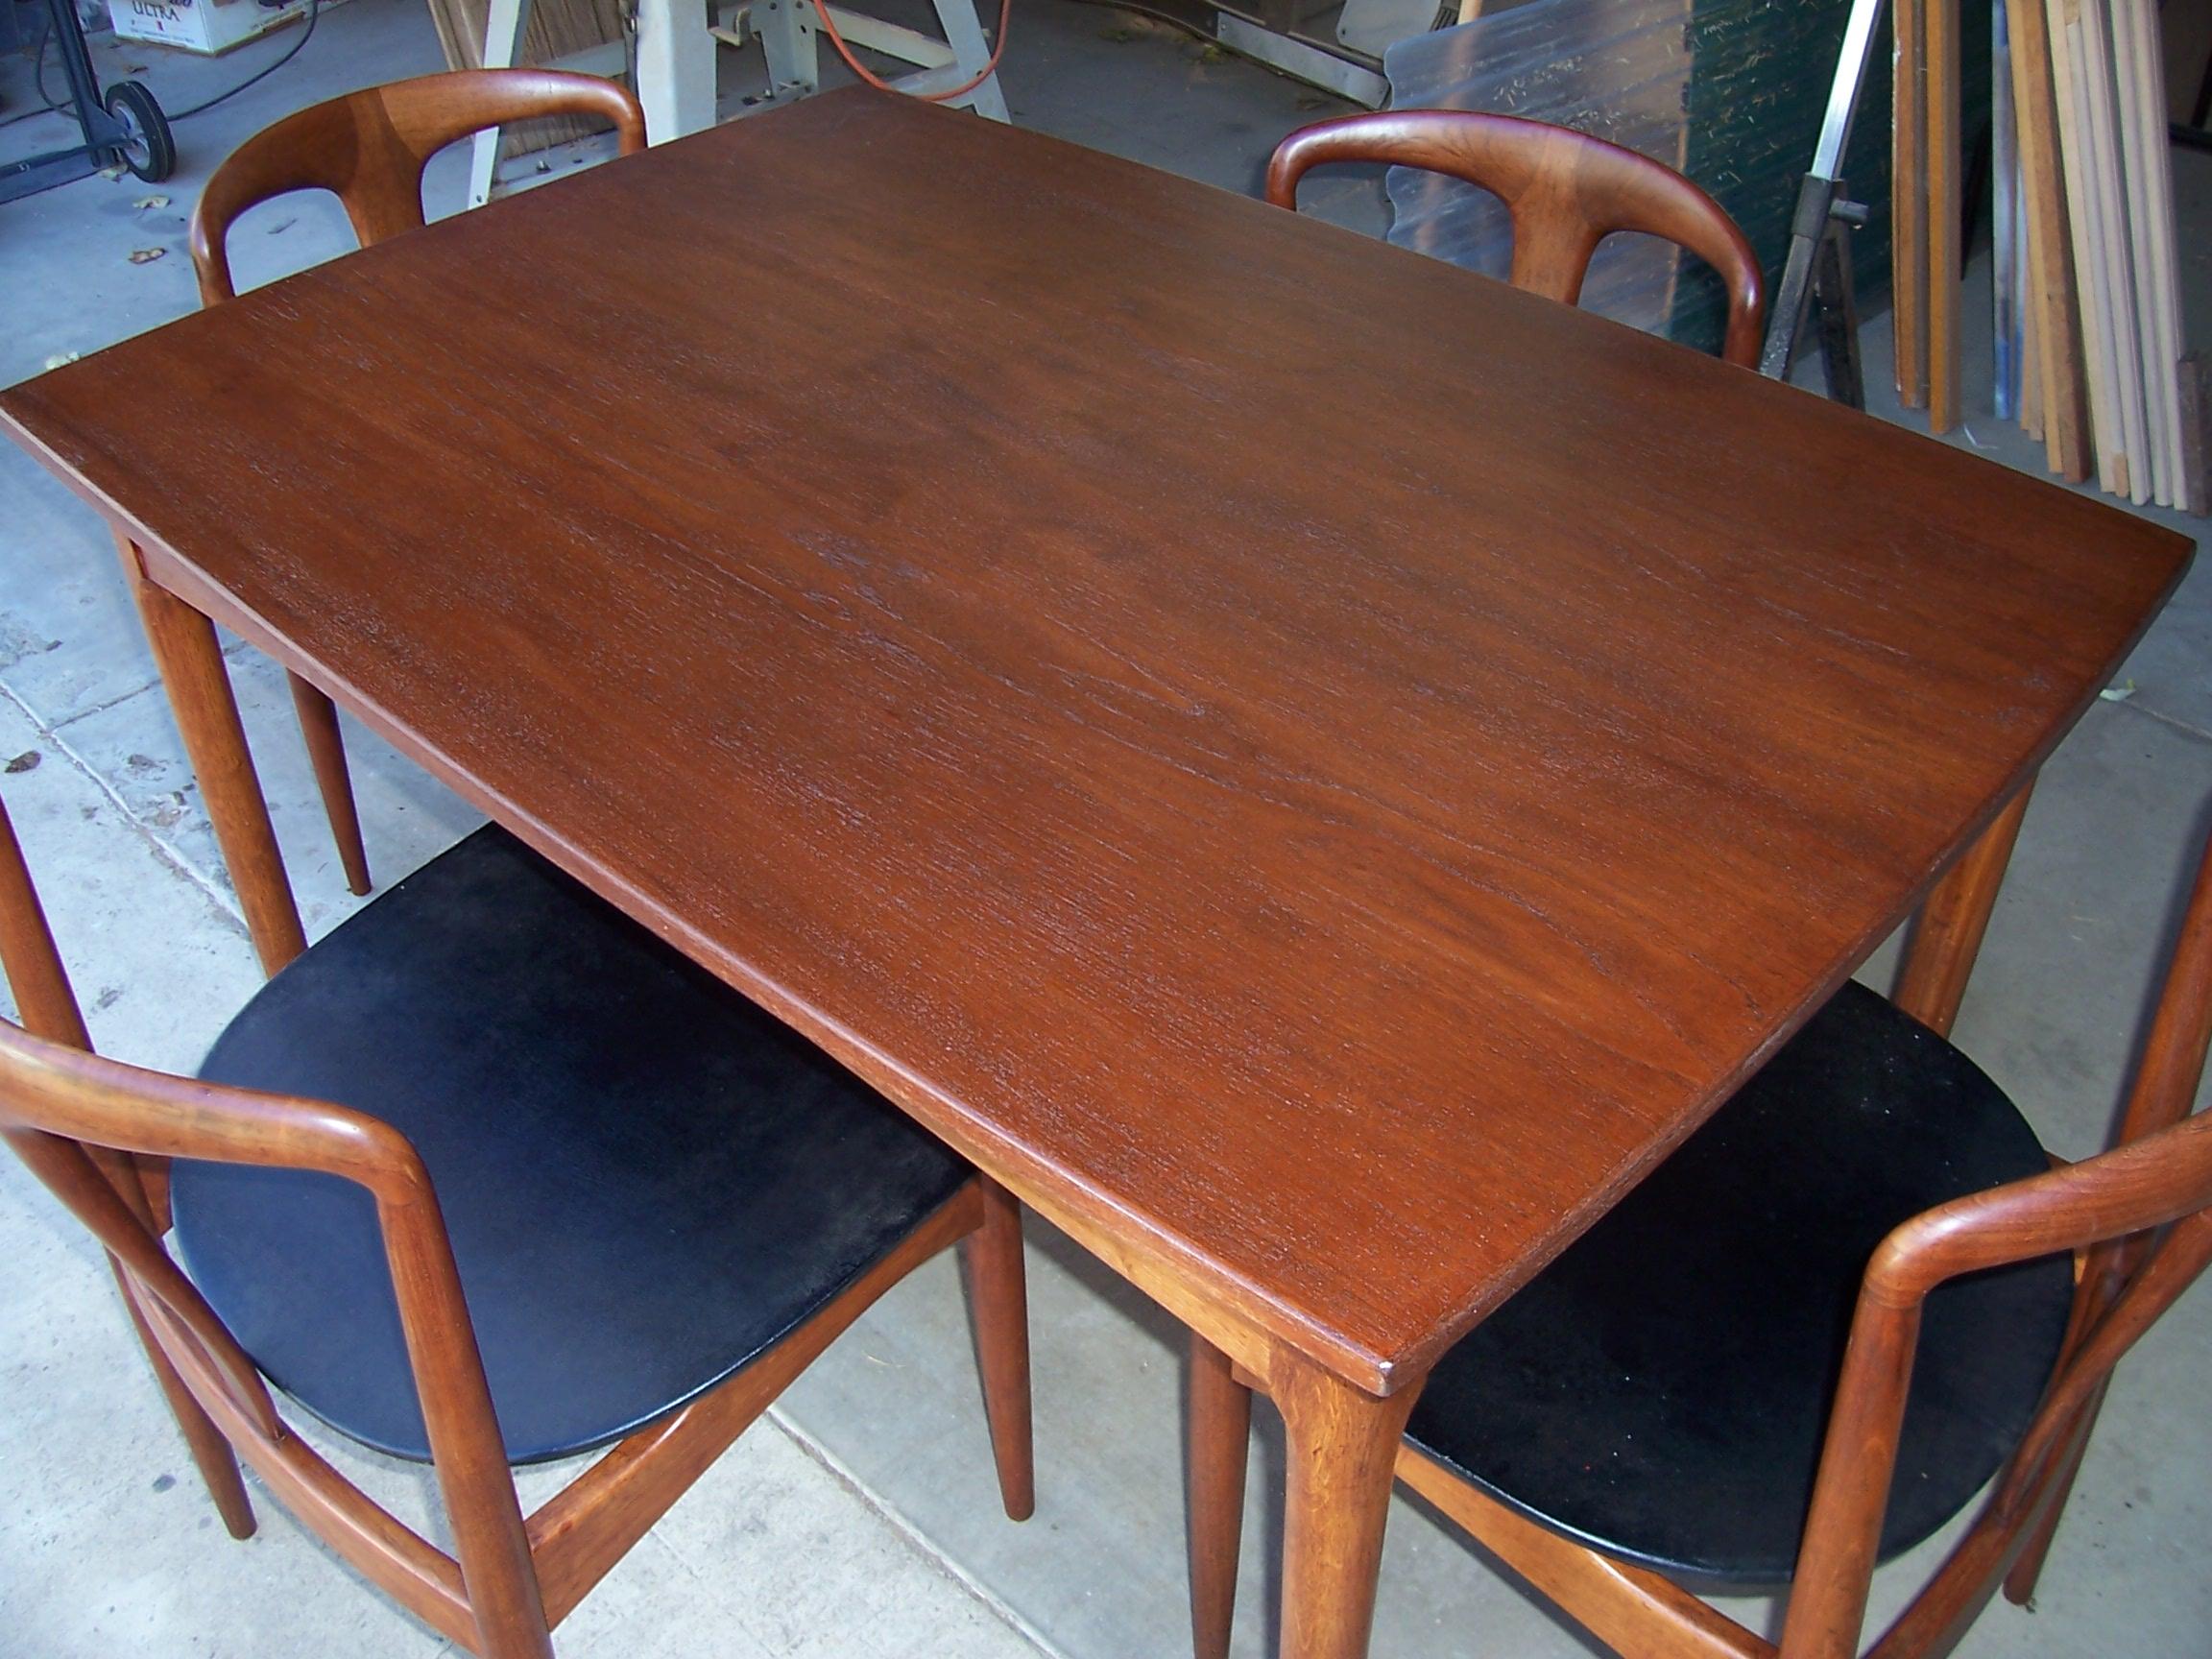 leather sofa repair orange county apartment fabric bed furniture refinishing service